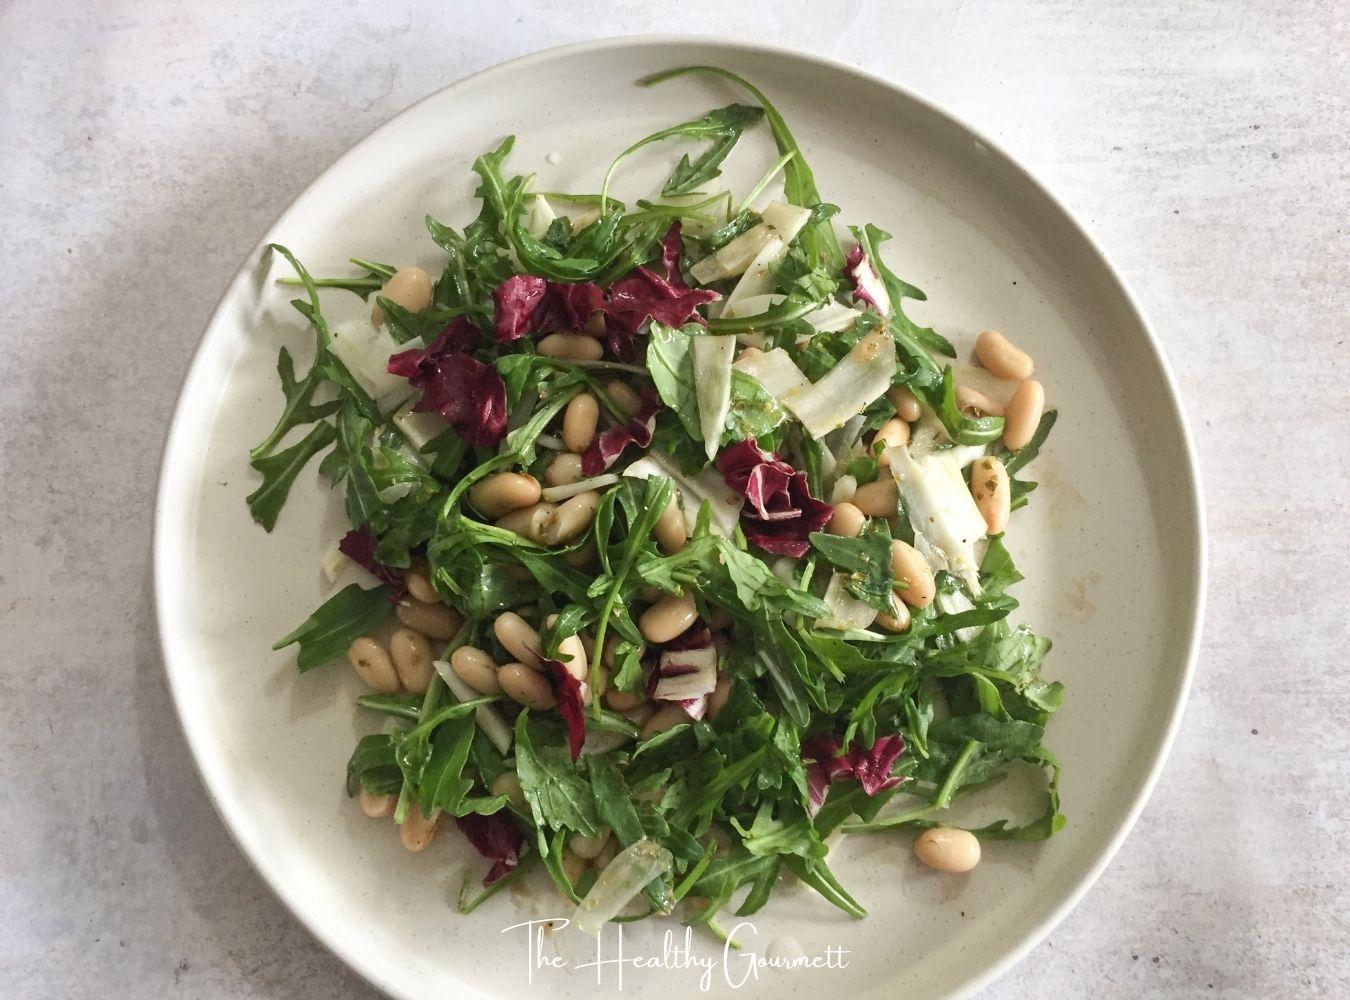 Fennel & white beans salad